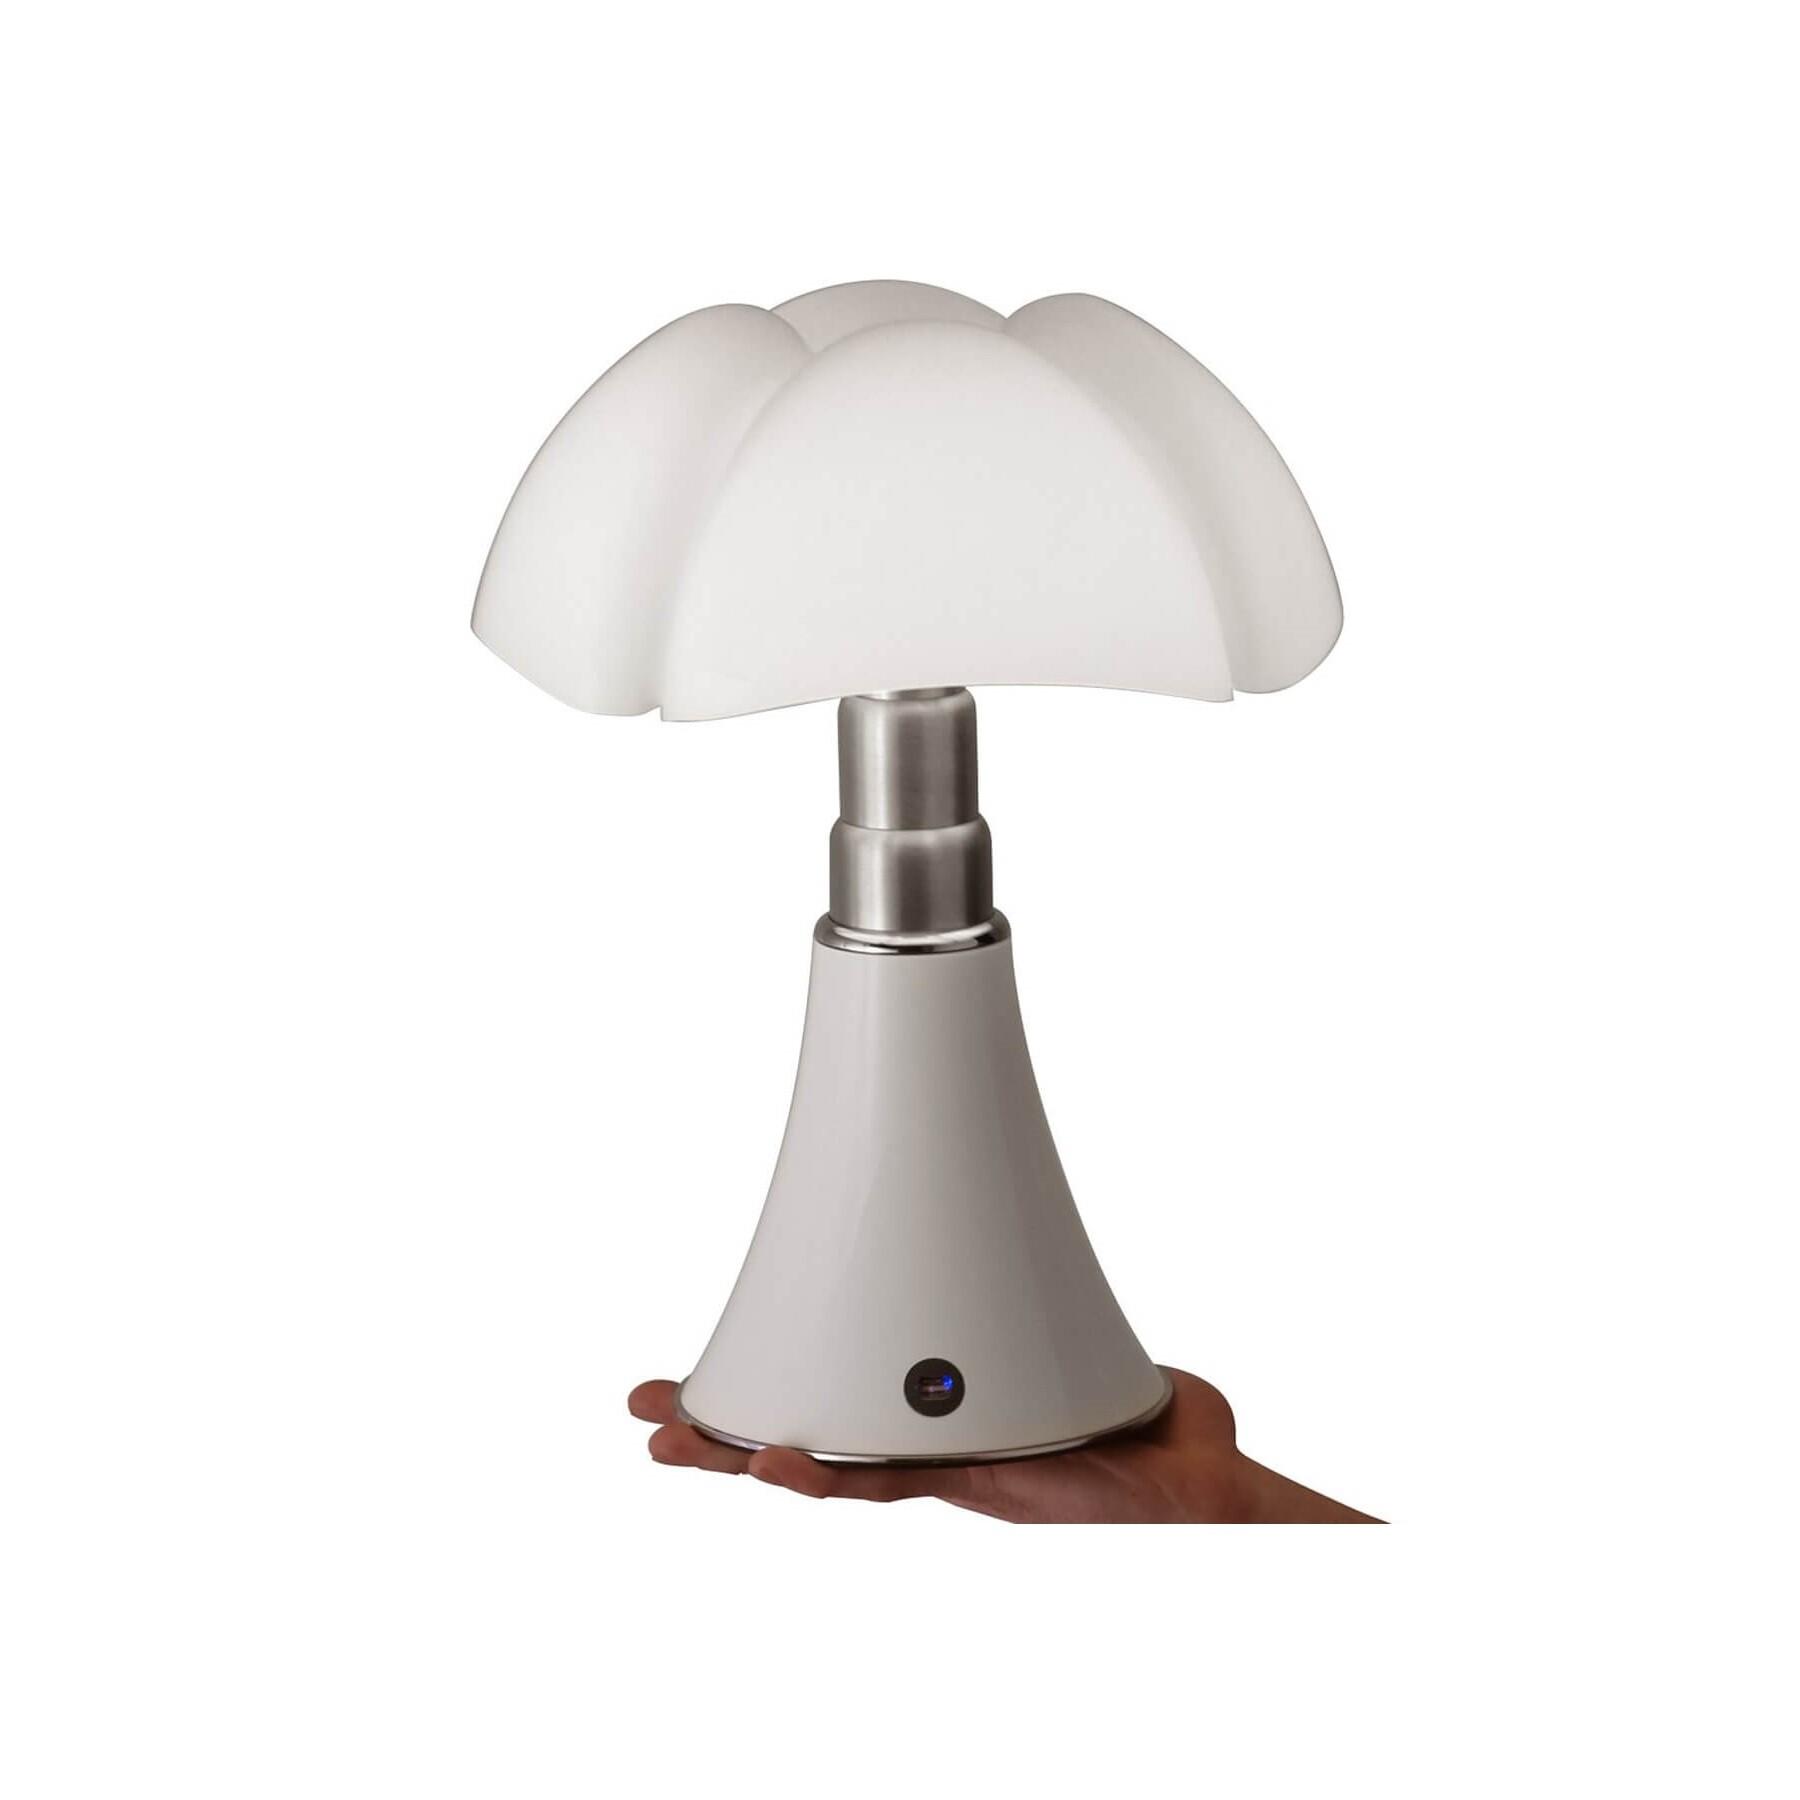 Image of MiniPipistrello Cordless Bordlampe Hvid - Martinelli Luce (12697922)